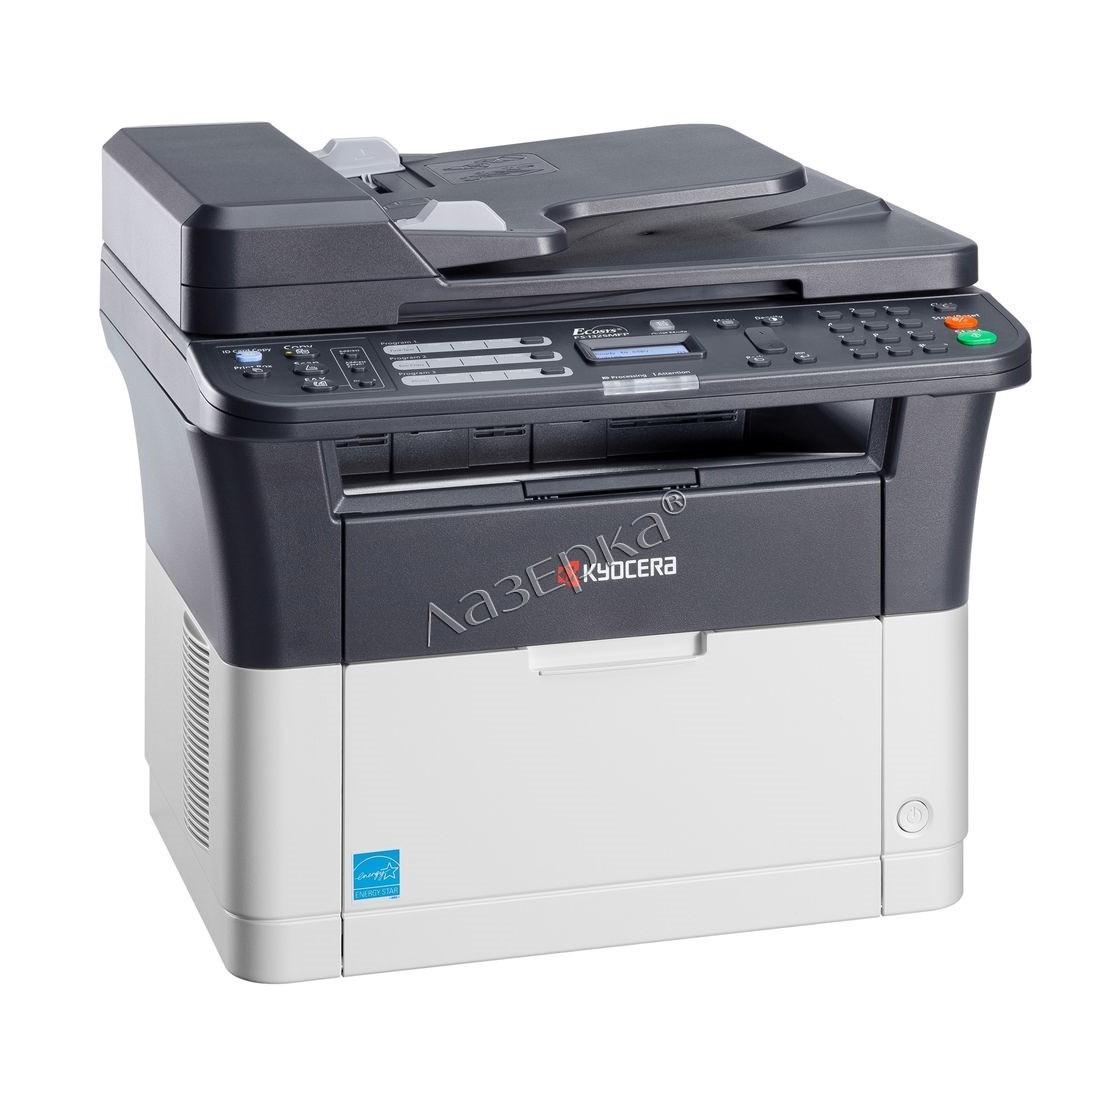 МФУ Xerox WorkCentre 3225DNI (A4 лазерный принтер/сканер/копир/факс 28стр/мин до 30K стр/мес 256MB Ethernet ADF Duplex)